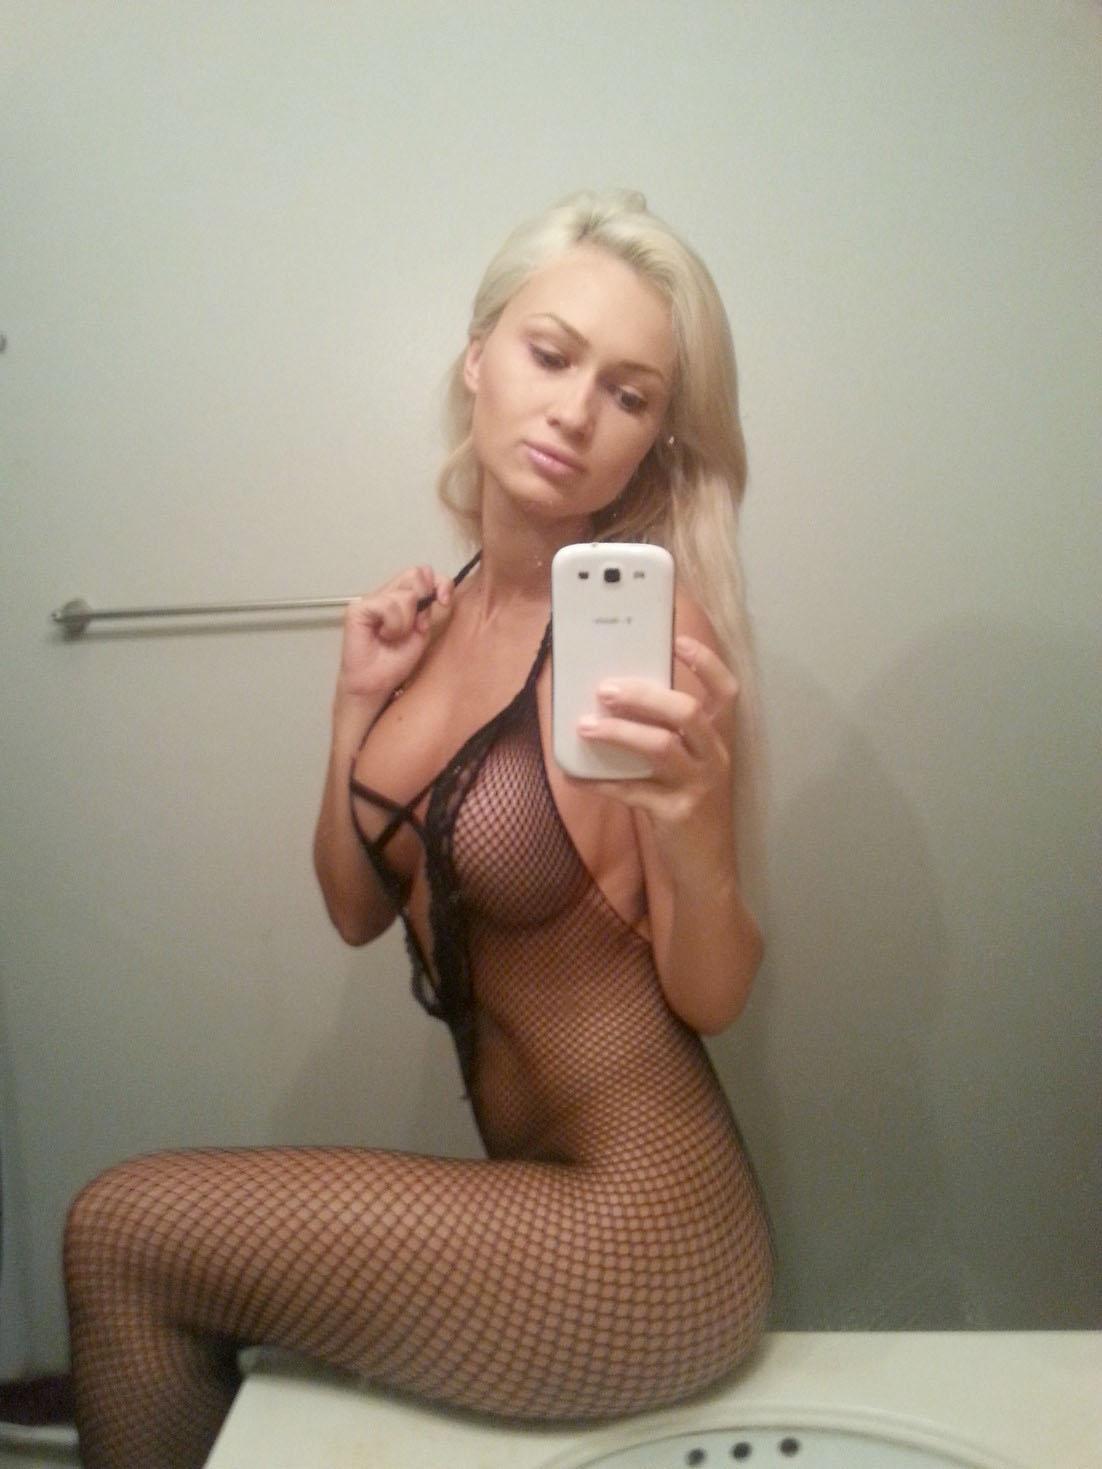 Swedish Model Ella Rose Nude Photos Leaked